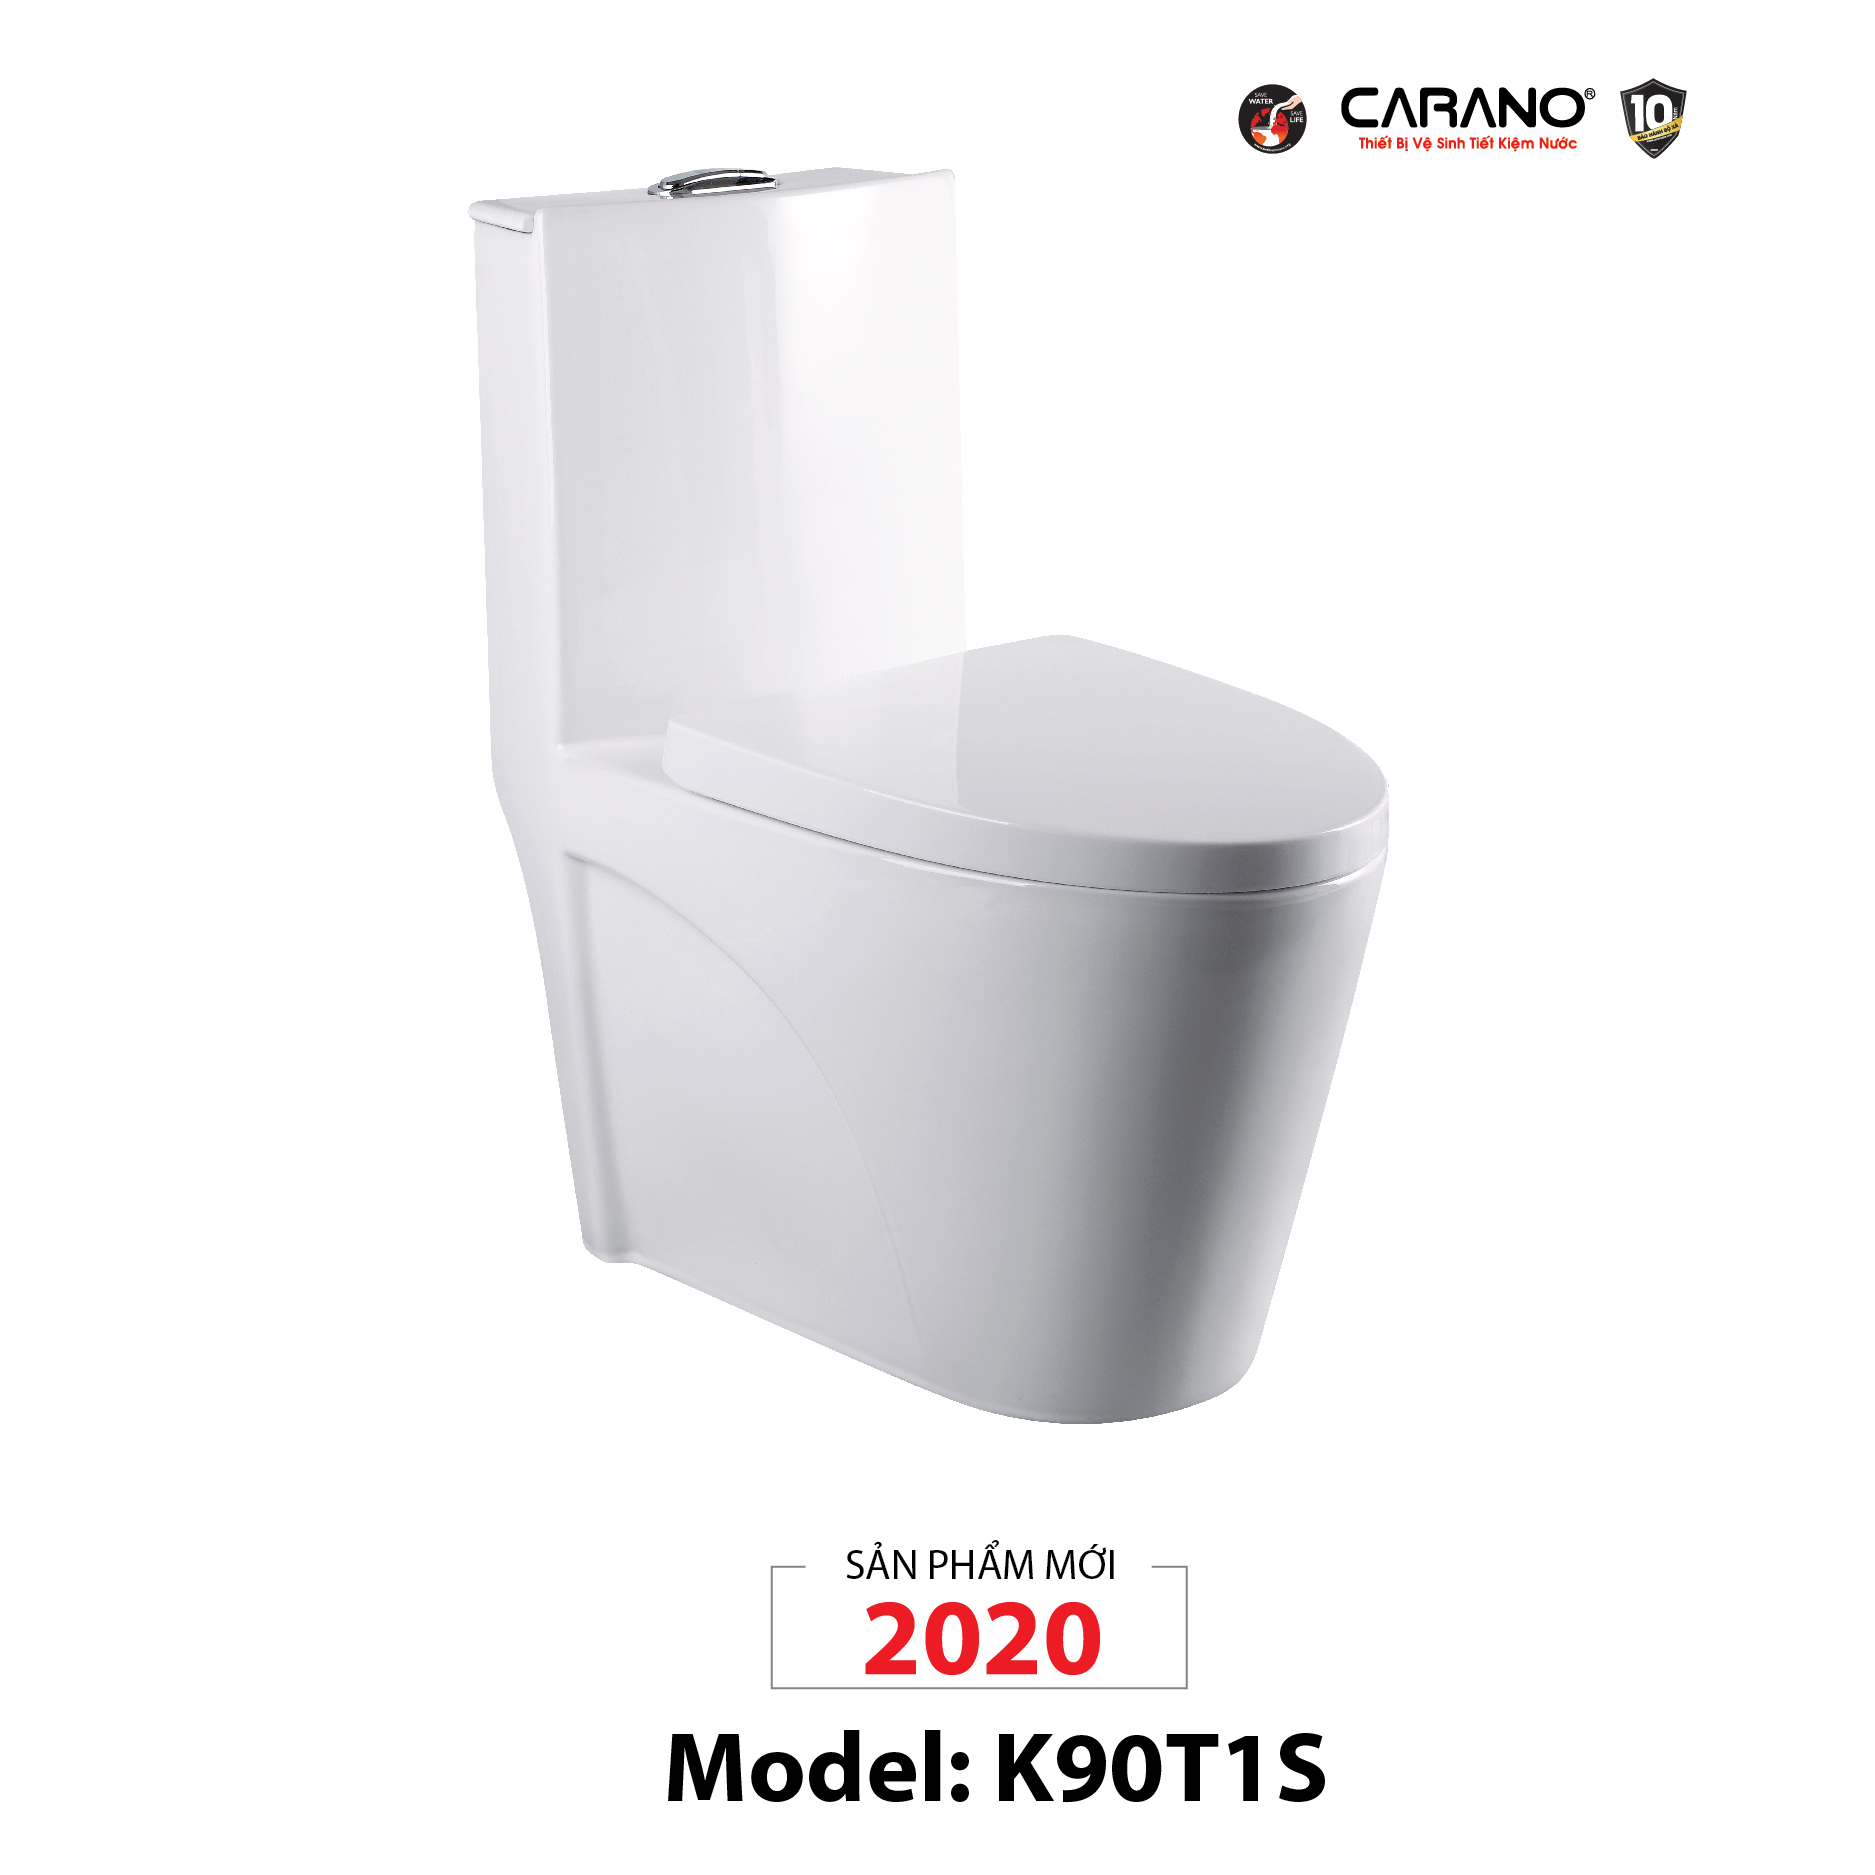 BỒN CẦU CARANO 1 KHỐI K90T1S (TOILET MODEL: K90T1S)